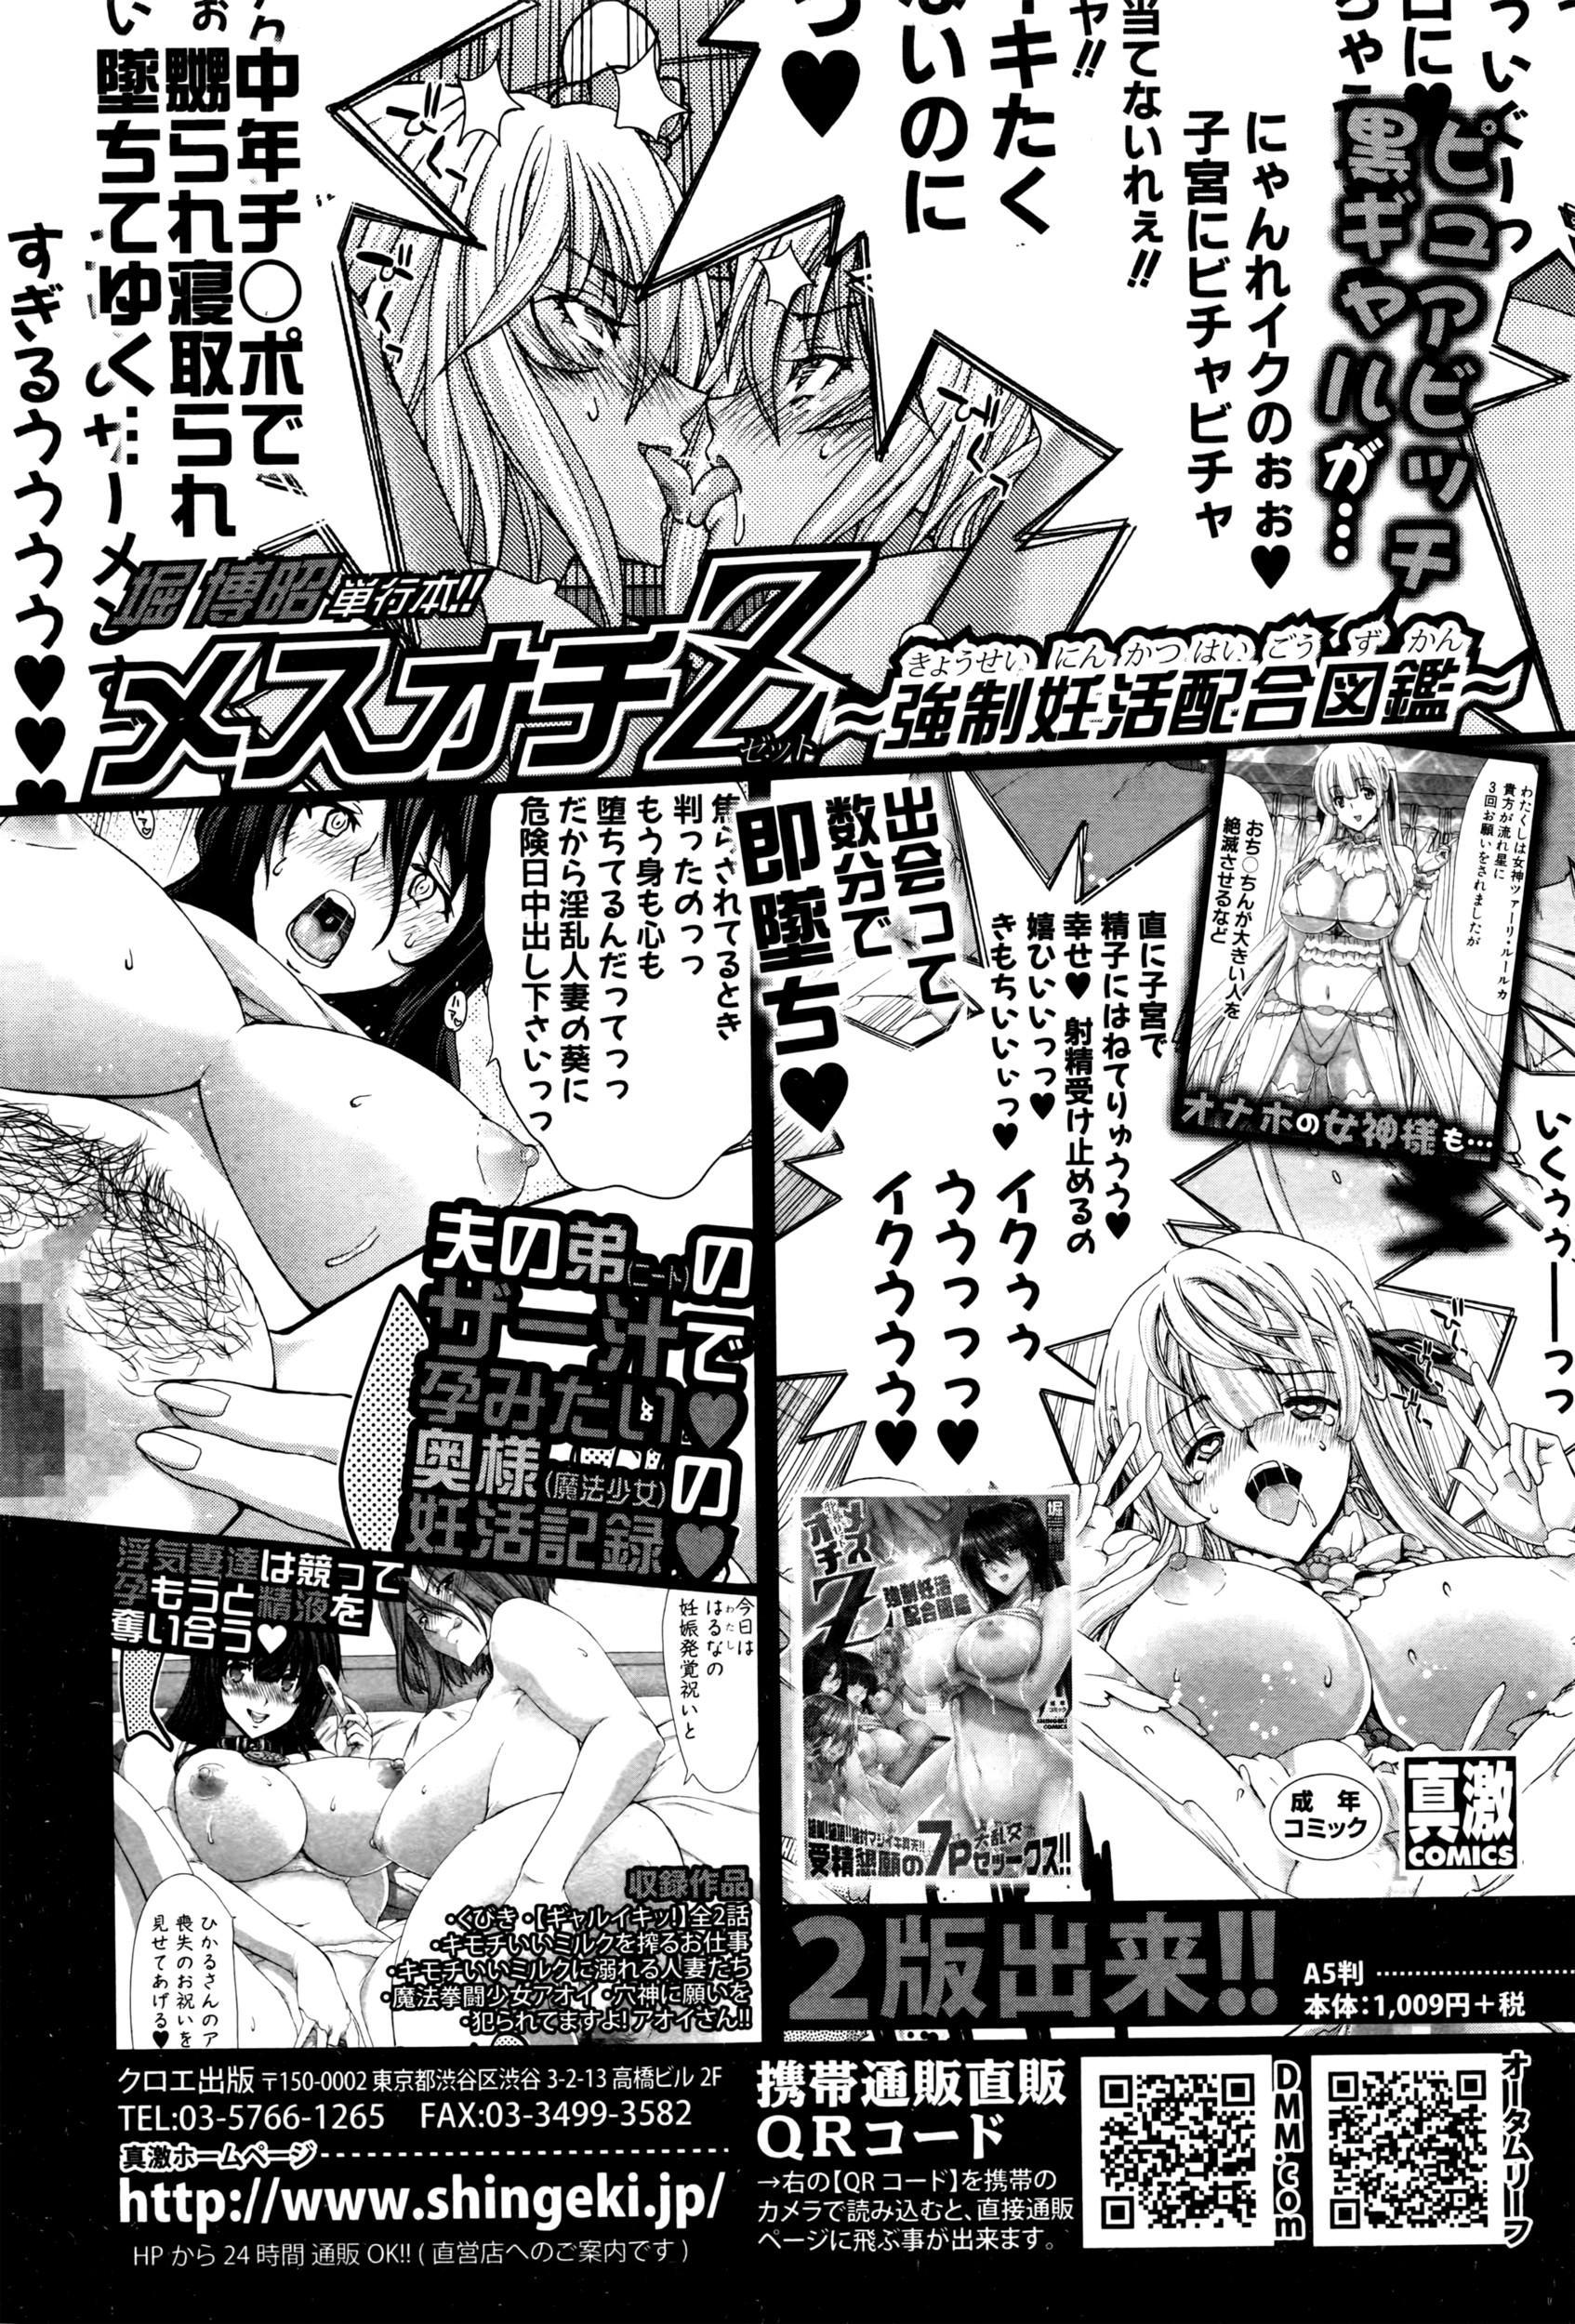 COMIC Shingeki 2016-04 89